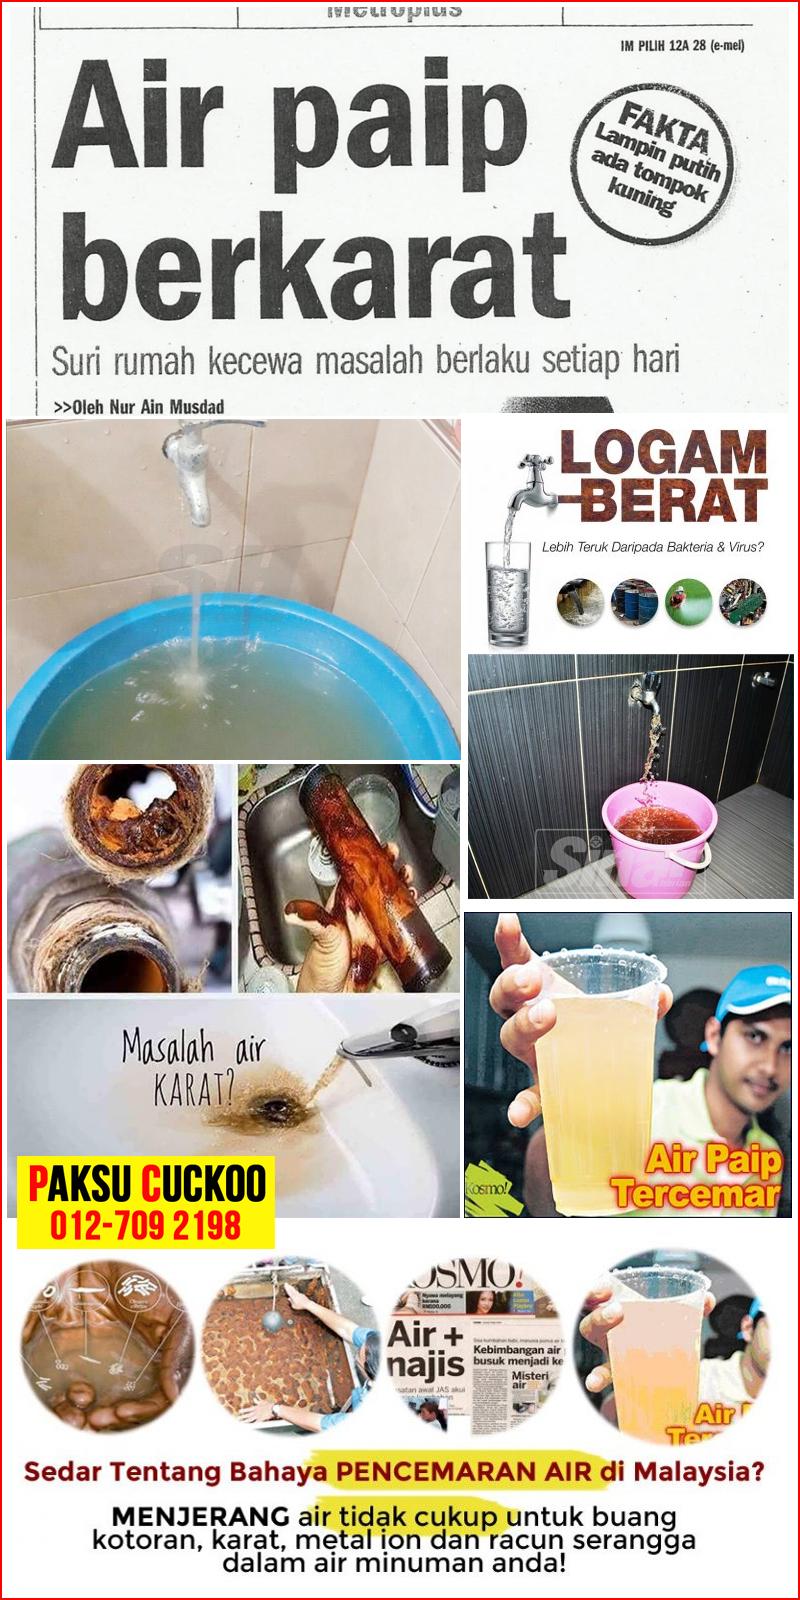 semua rumah di malaysia memerlukan cuckoo outdoor water purifier sabah kota kinabalu mesin penulen air luar rumah untuk membersihkan air yang masuk ke dalam rumah bersih